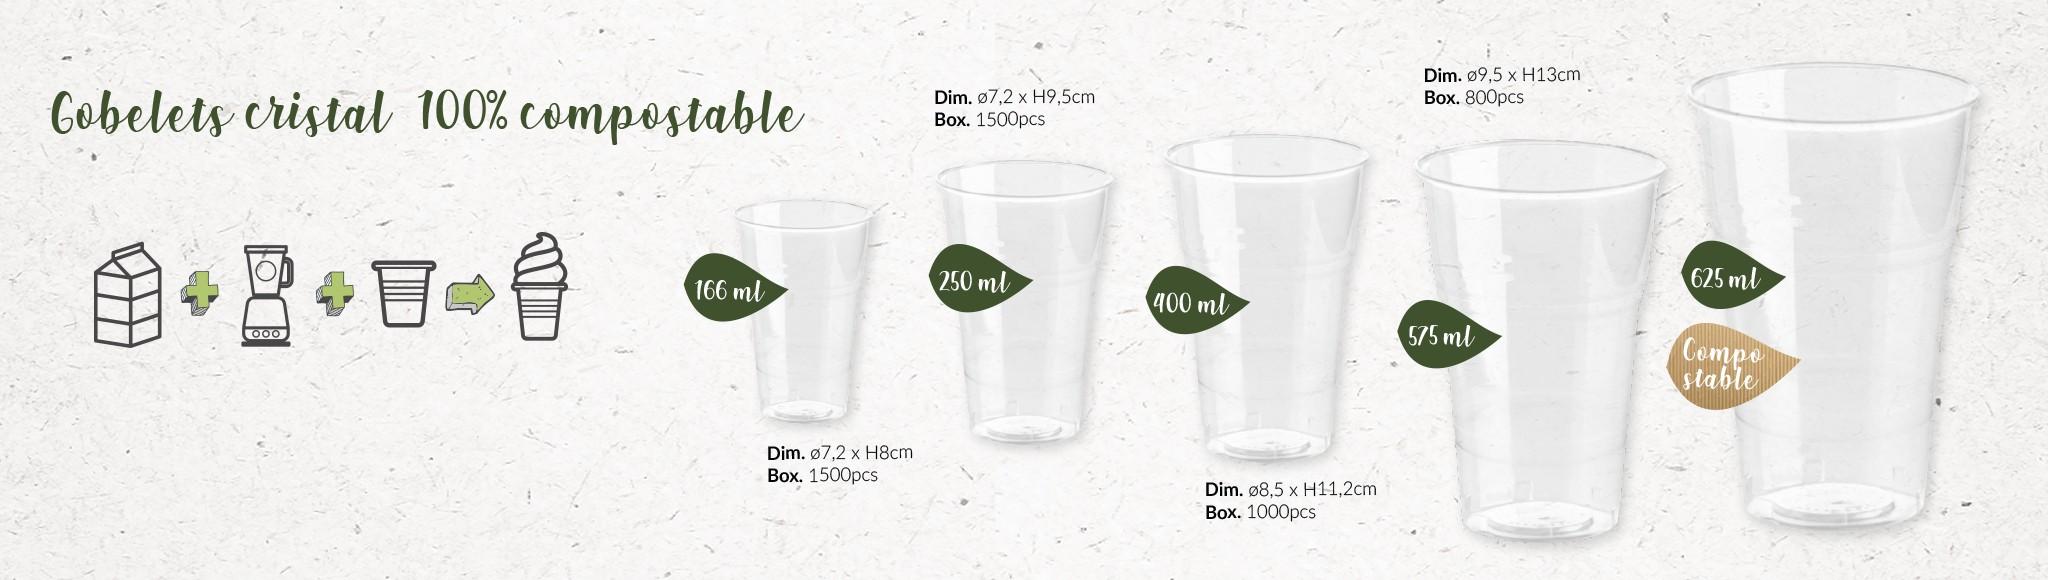 Gobelets 100% compostables